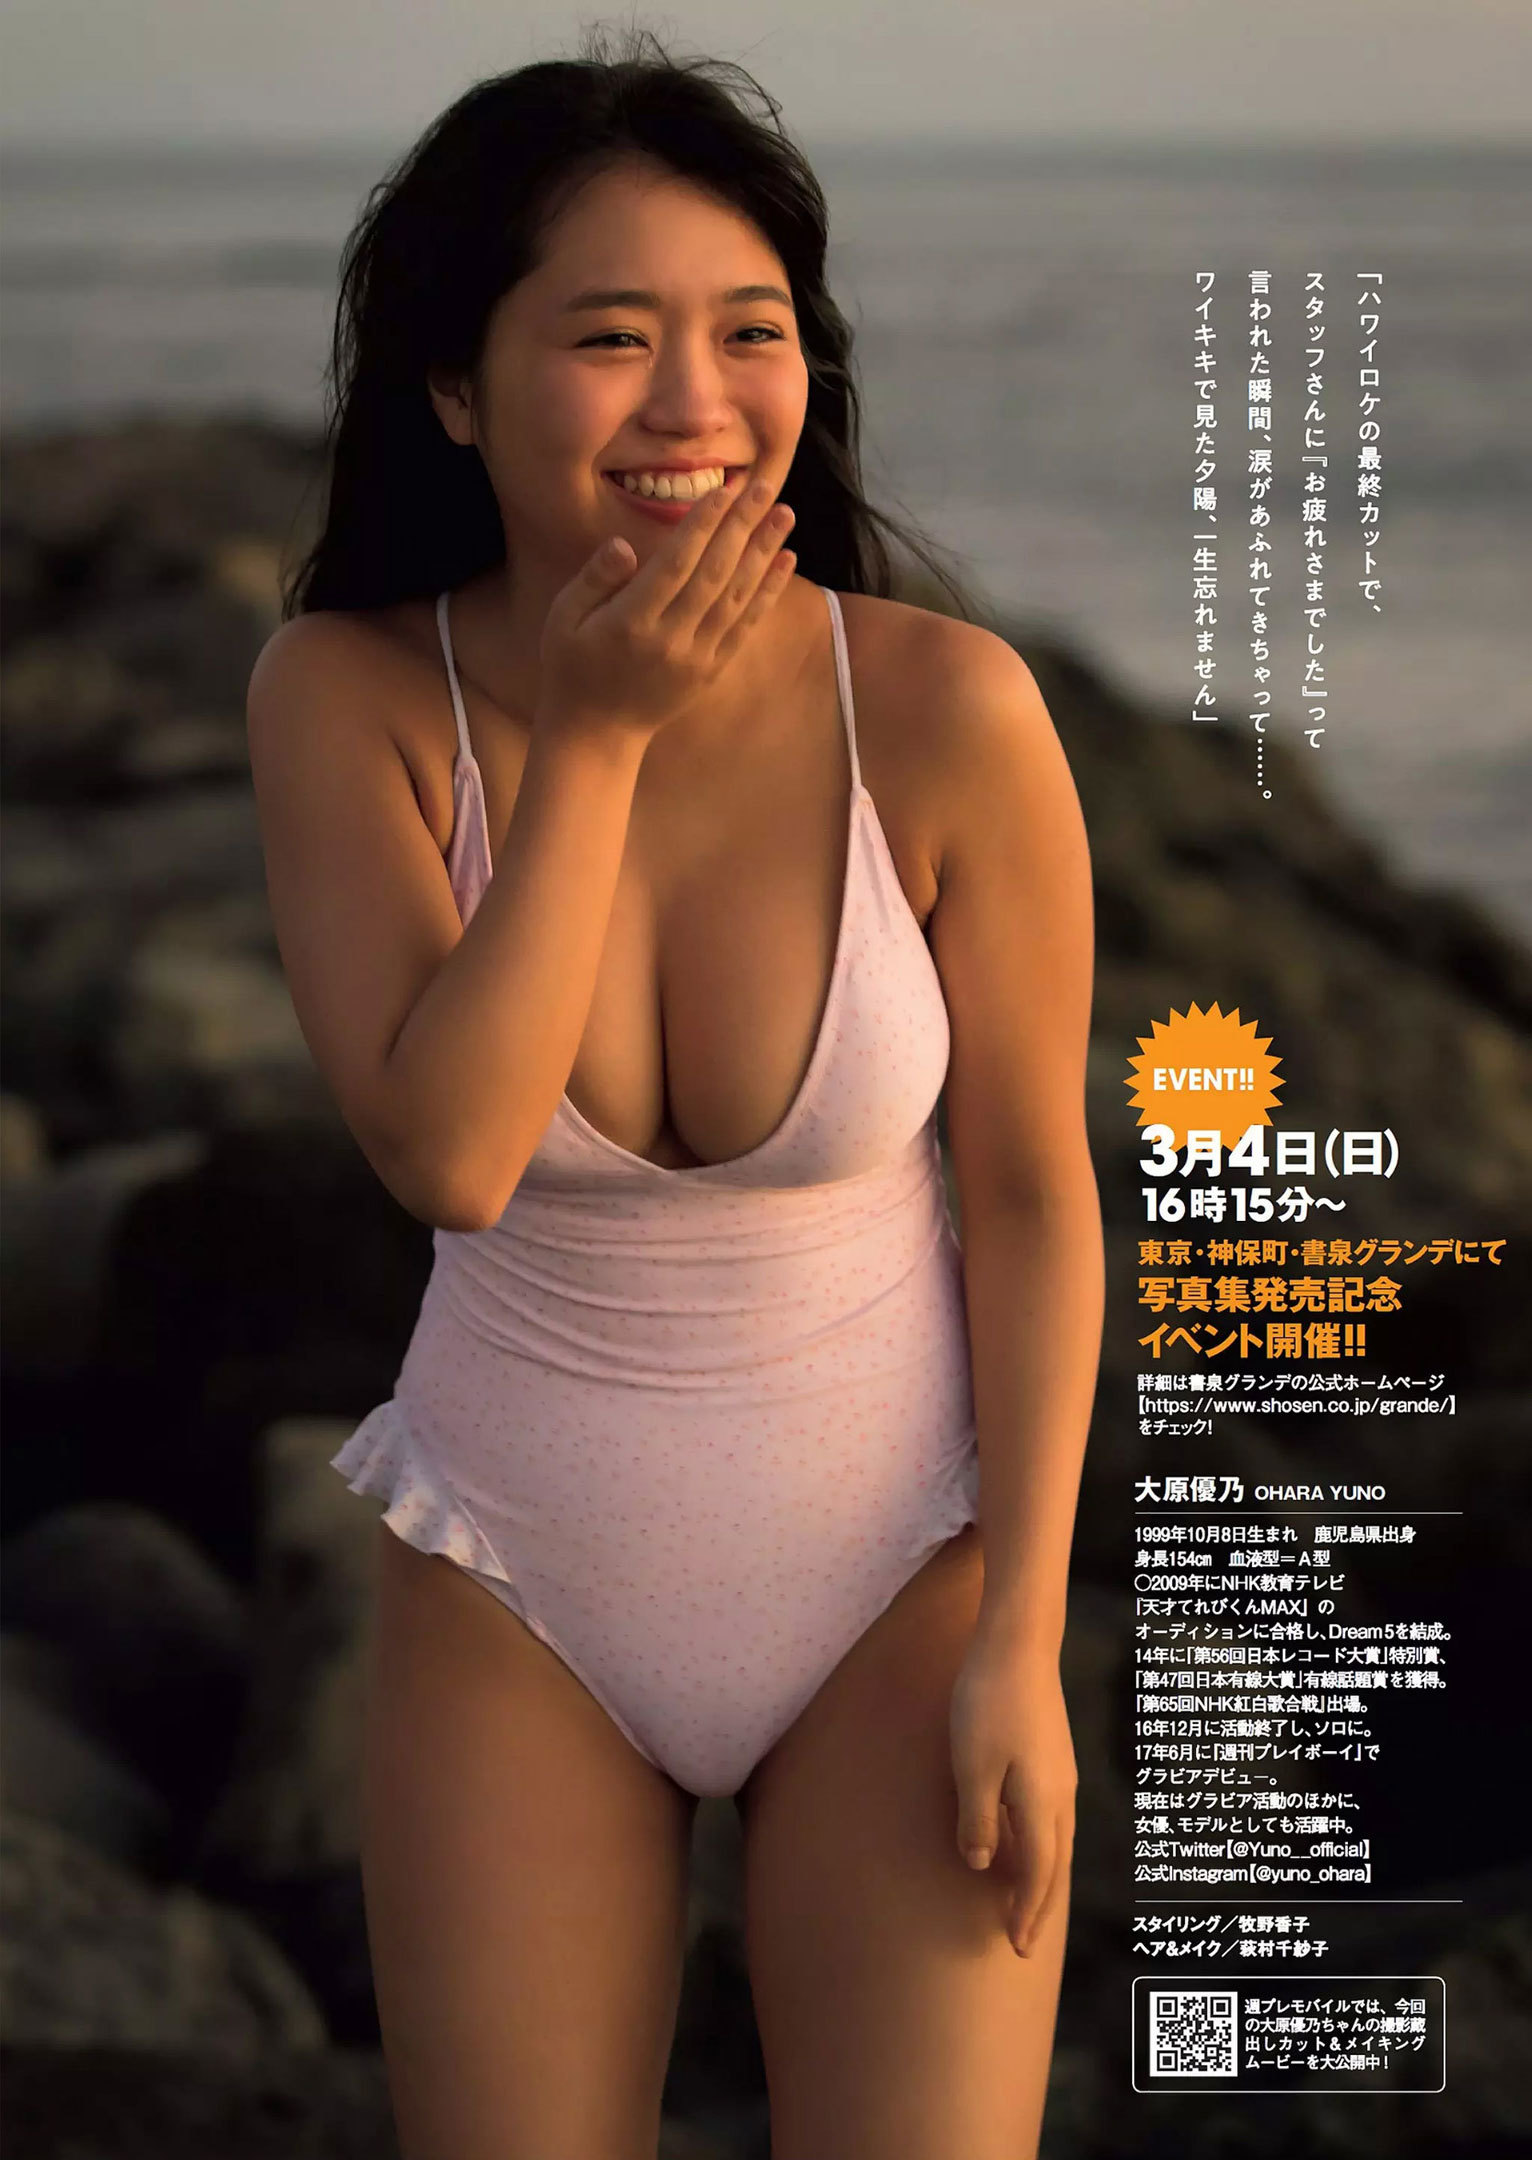 oohara_yuno125.jpg